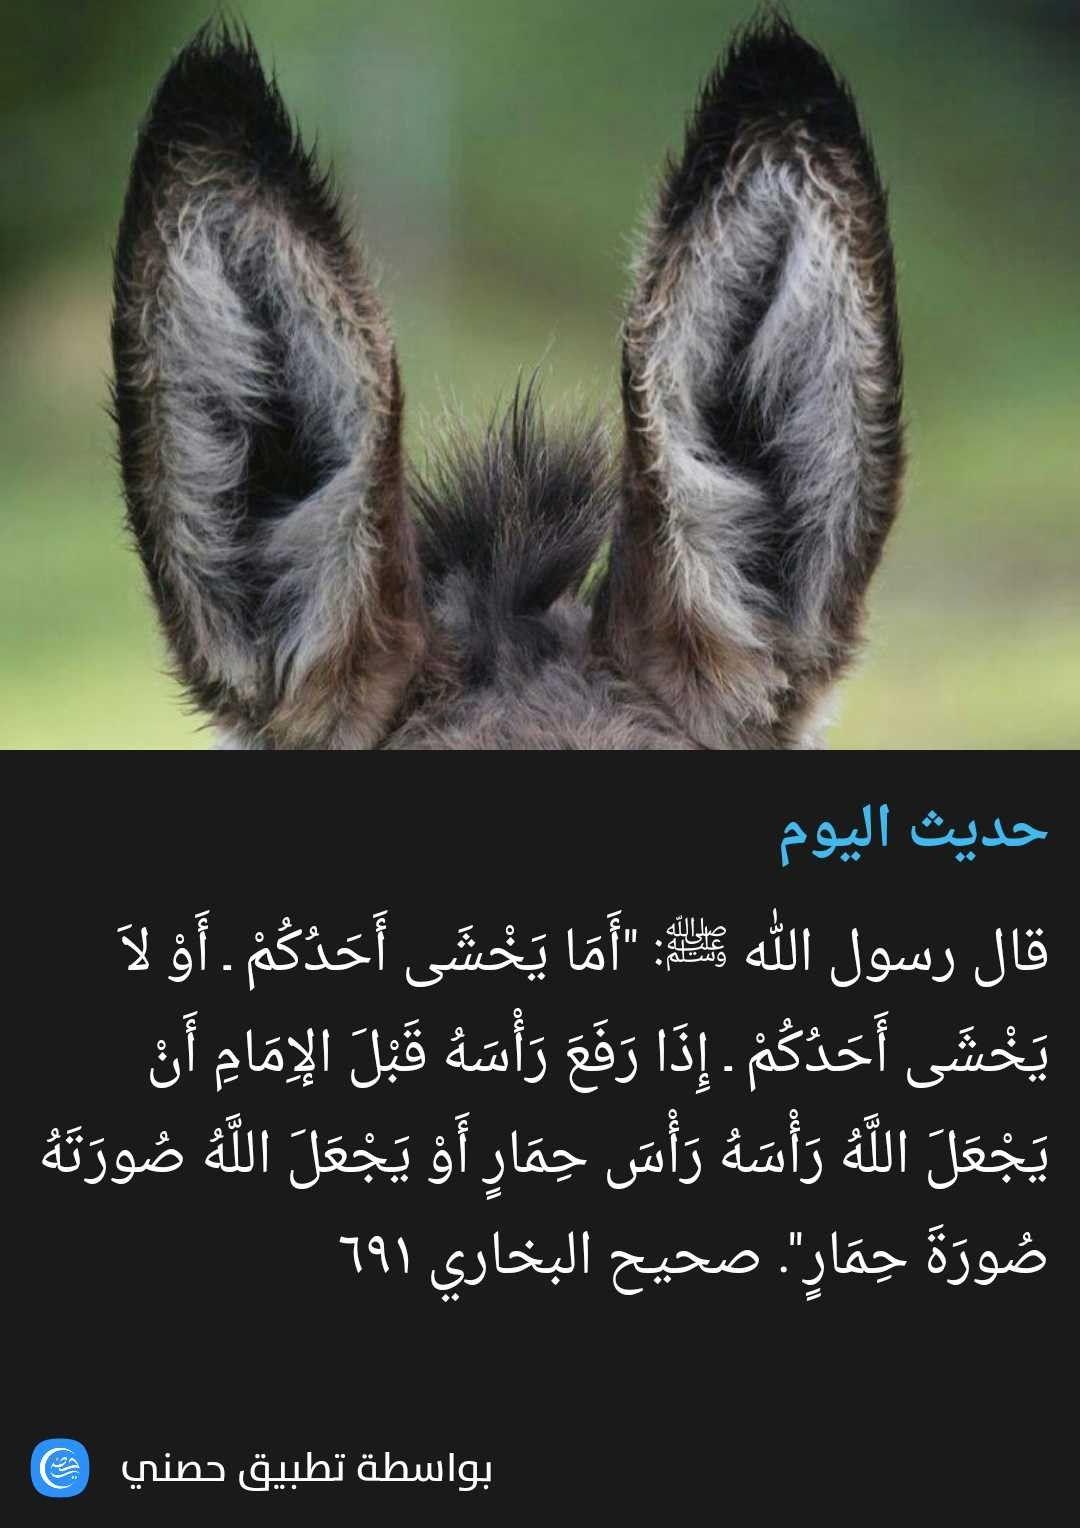 Pin By عبق الورد On أحاديث نبوية ٢ Islamic Quotes Quran Islamic Quotes Hadith